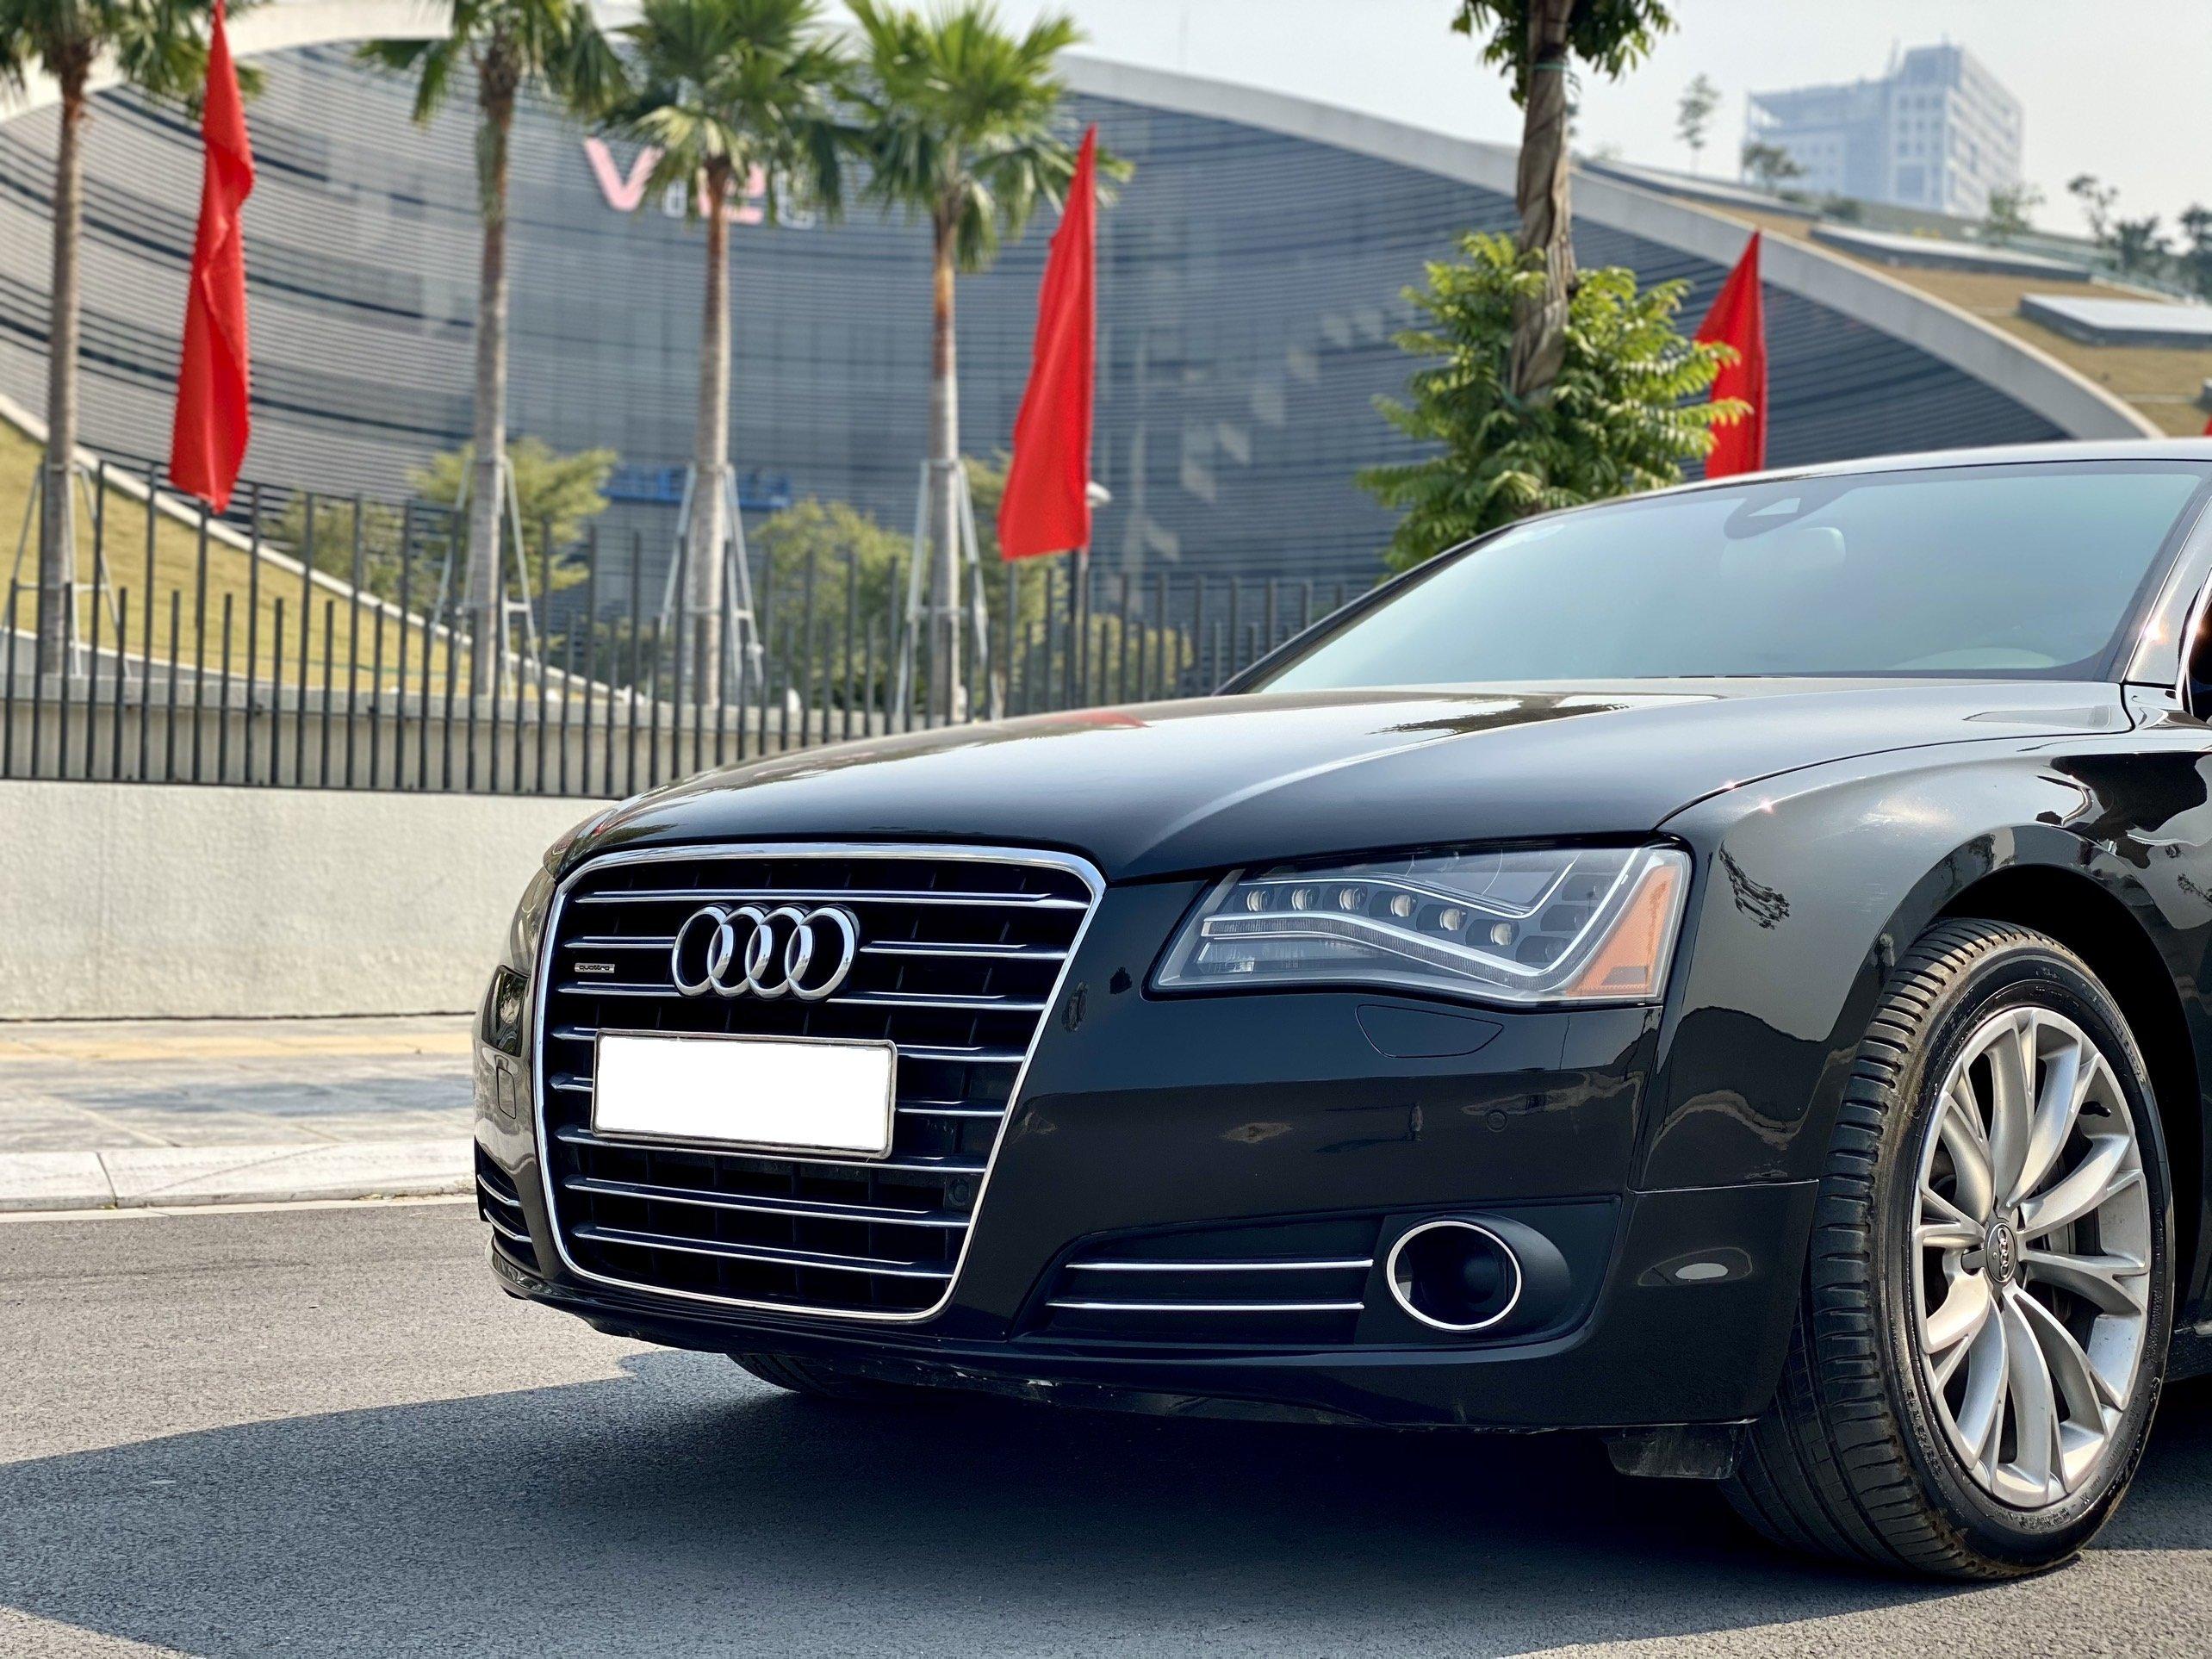 Audi A8 sản xuất 2010